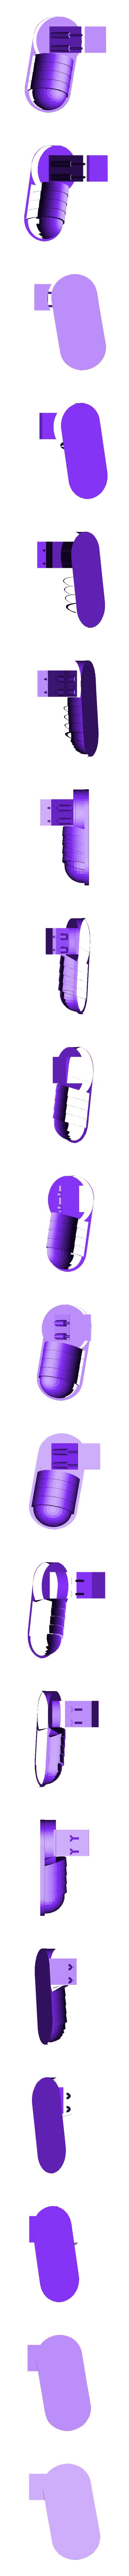 right_foot.stl Télécharger fichier STL gratuit Ork Great Gargant 6mm Epic Scale Proxy model • Objet à imprimer en 3D, redstarkits